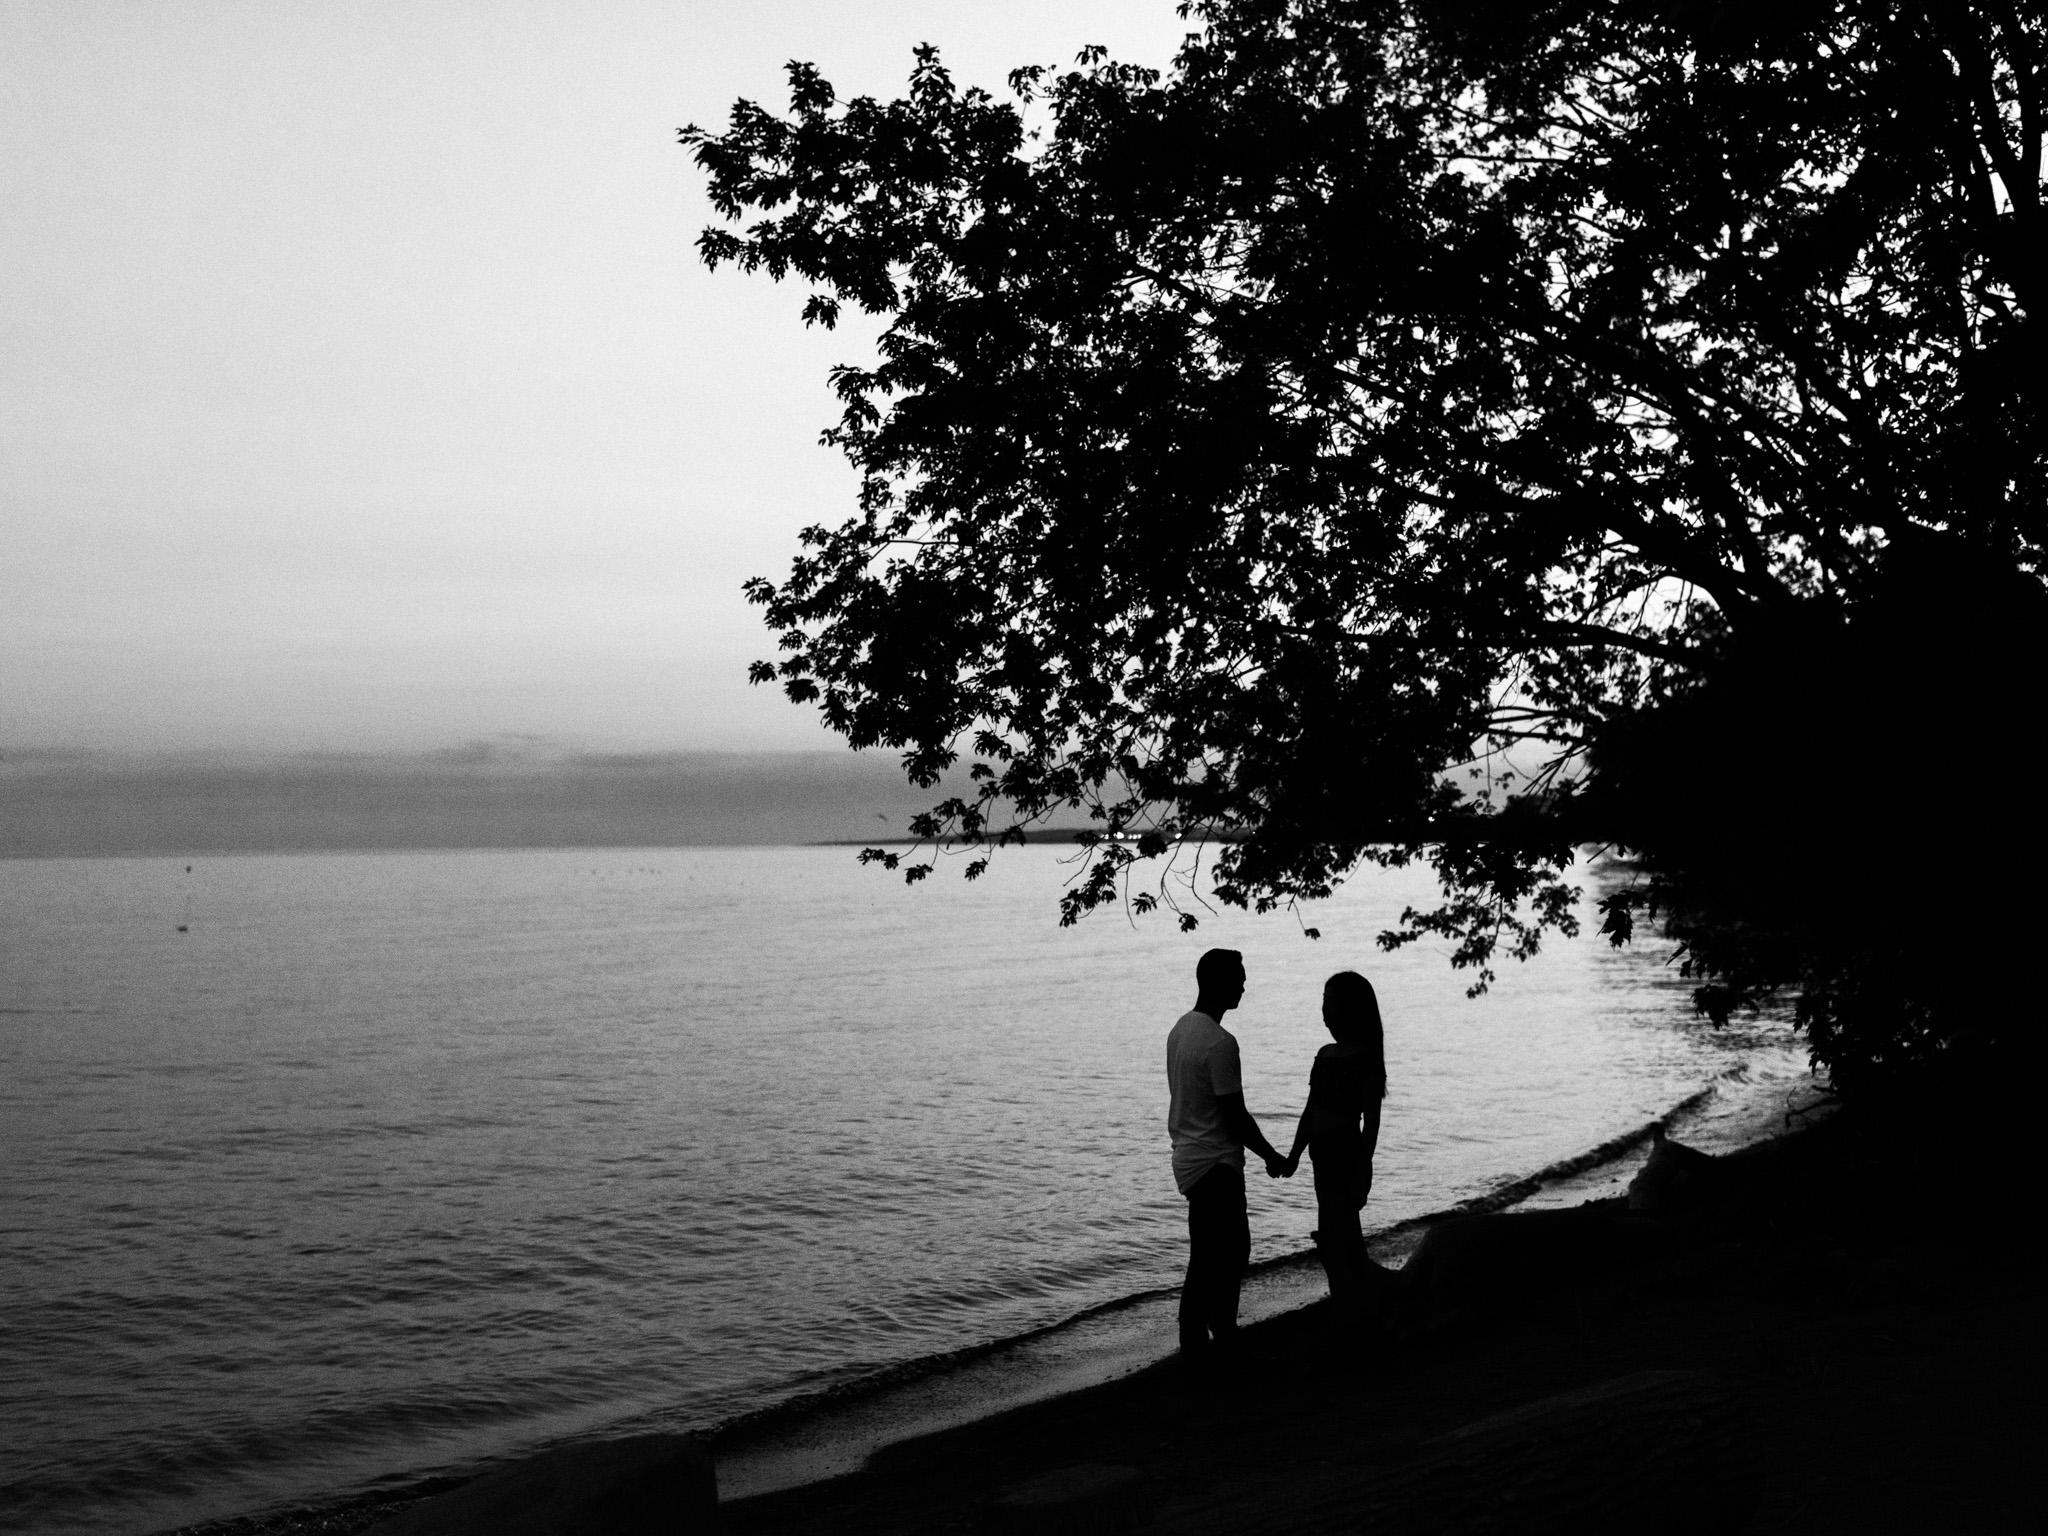 sunsetbeachengagement-torontoweddingphotographer-28.jpg